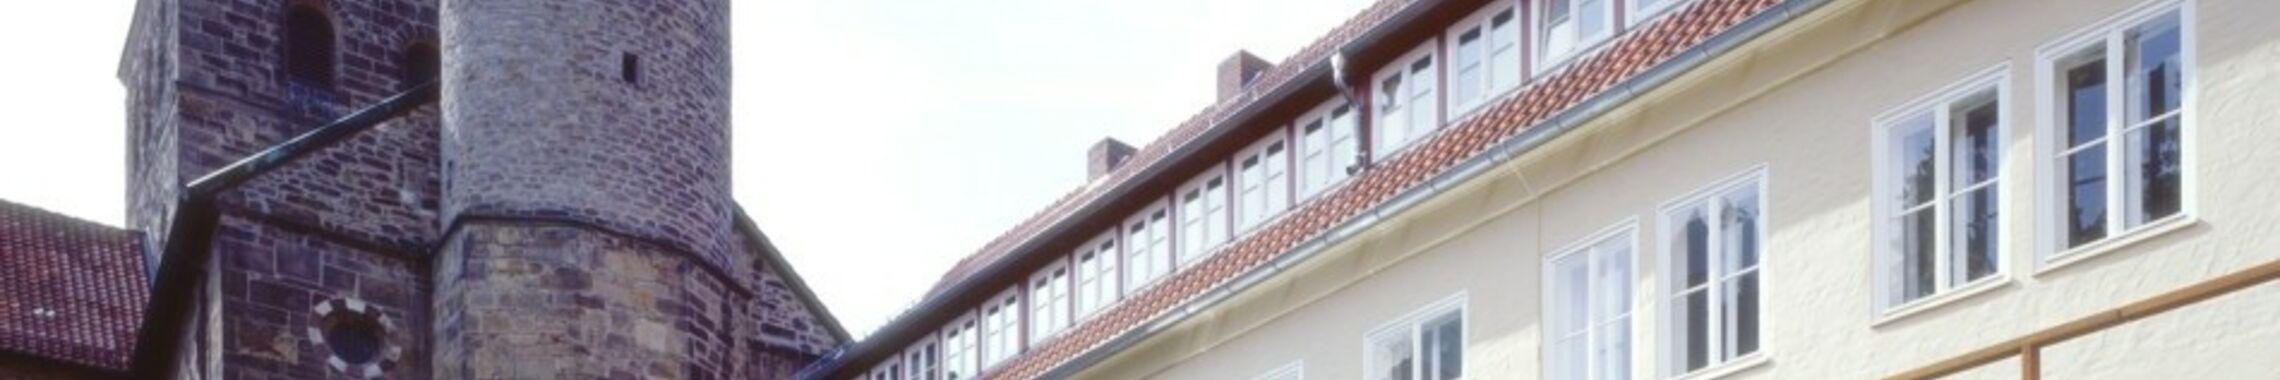 Innenhof-Kreuzgang_header_4